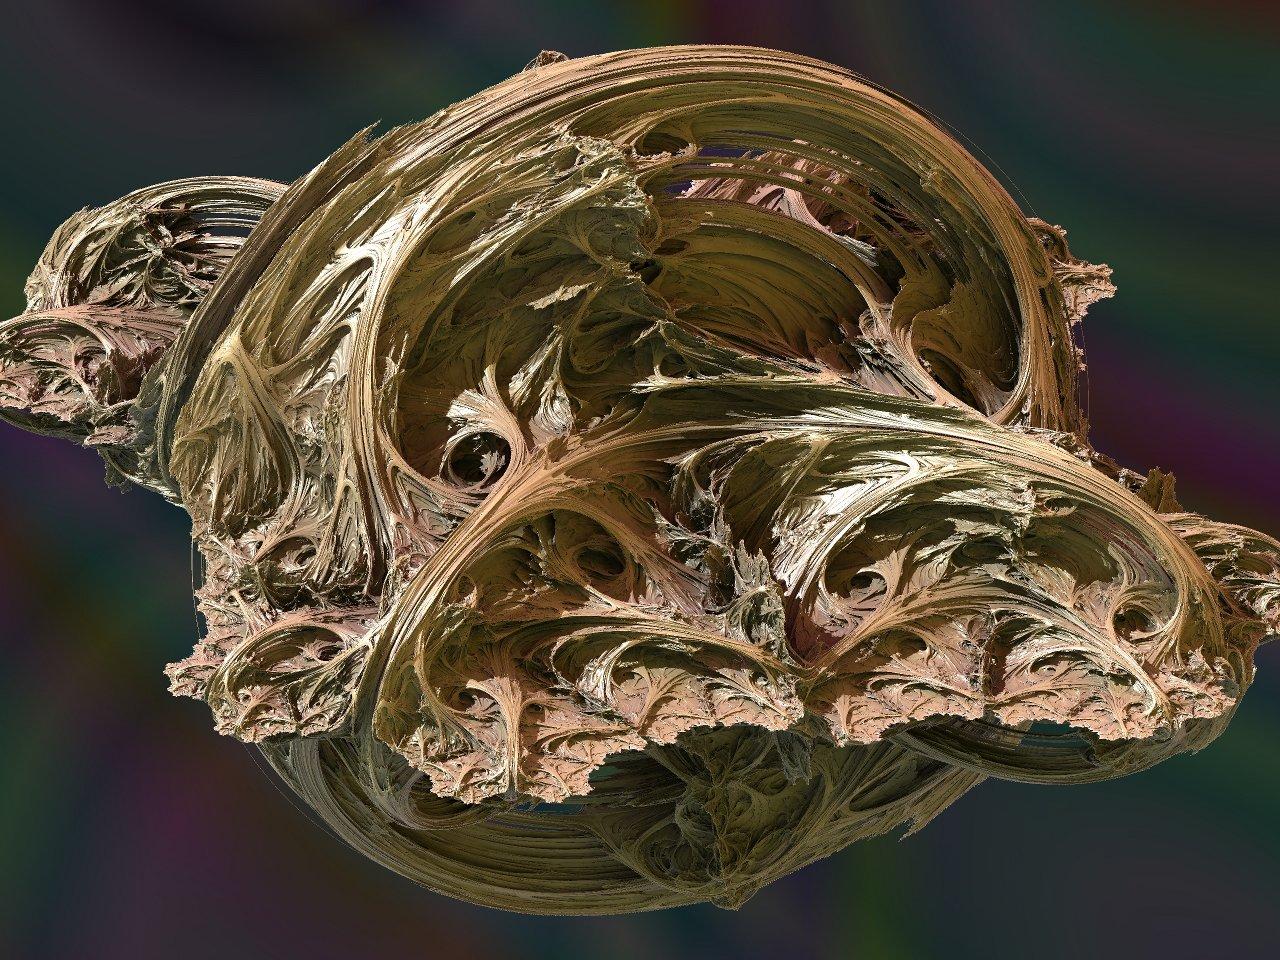 Modified Julia 3D fractal